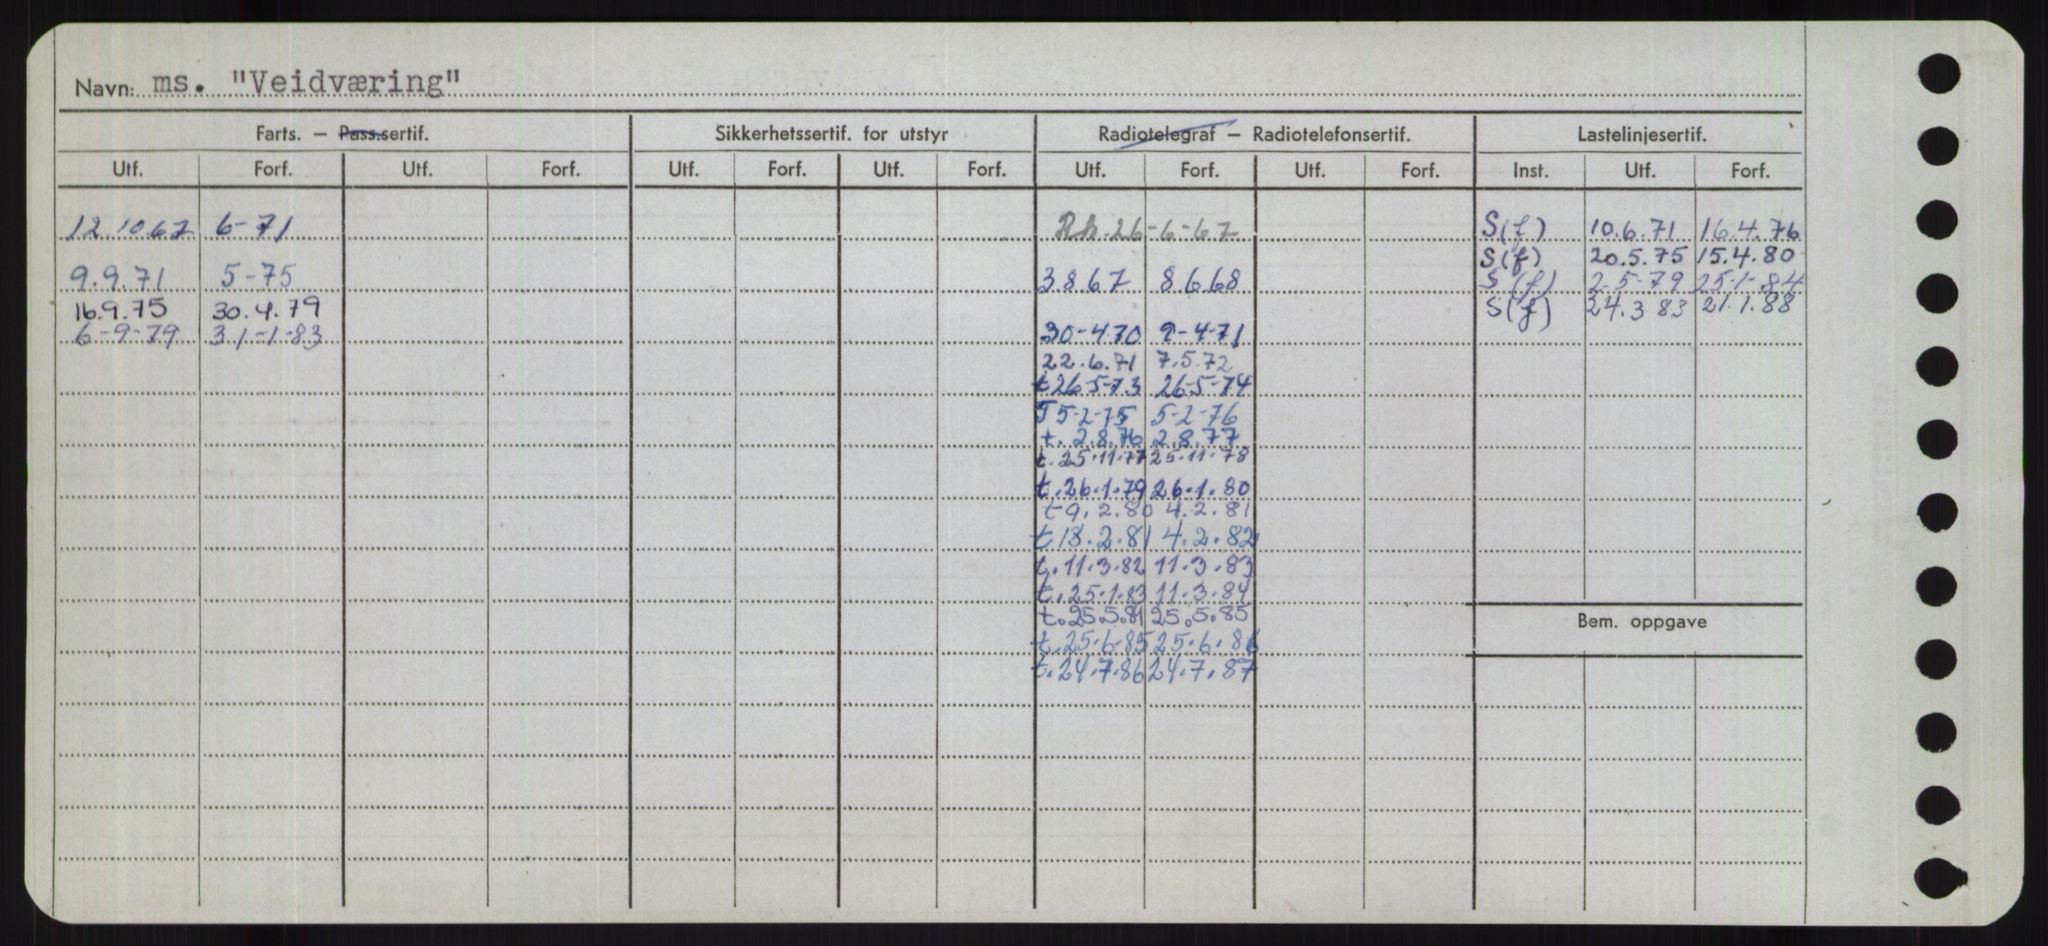 RA, Sjøfartsdirektoratet med forløpere, Skipsmålingen, H/Ha/L0006: Fartøy, Sver-Å, s. 218